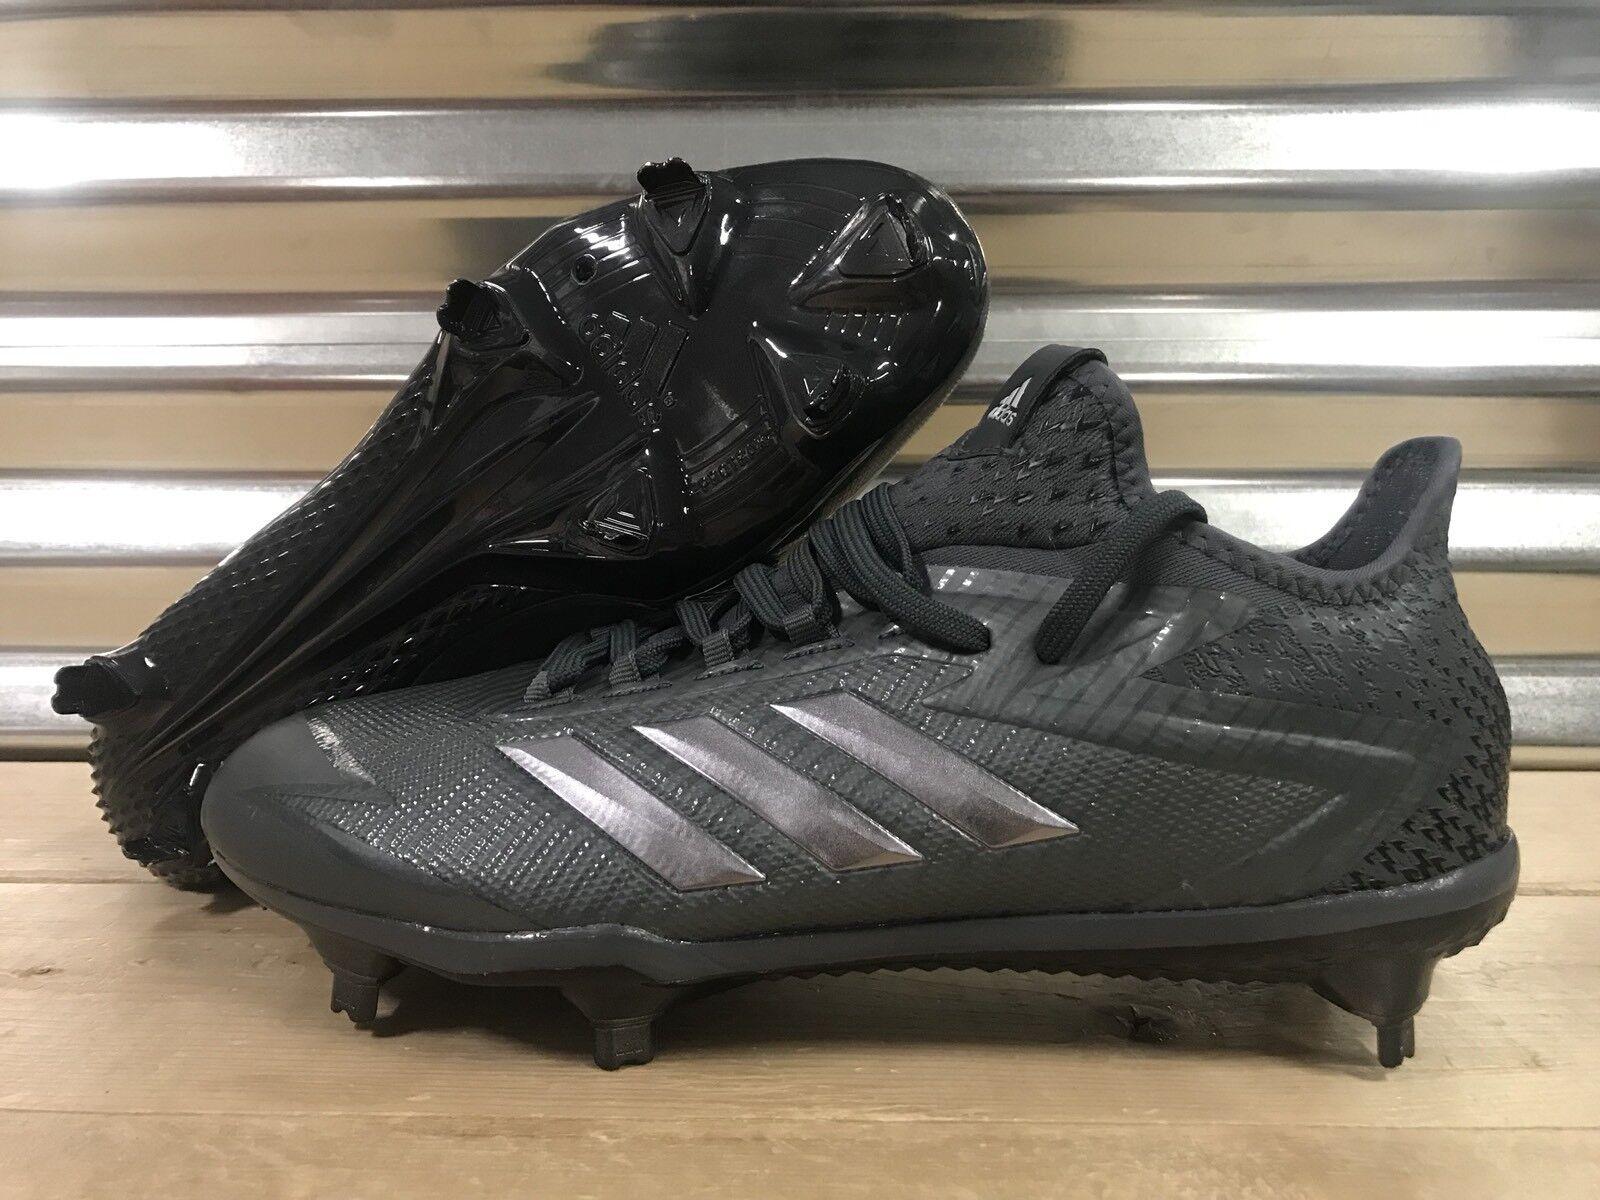 Adidas adizero postbruciatore 4 campione campione campione scarpe da baseball gray (aq0648) 71c3b8